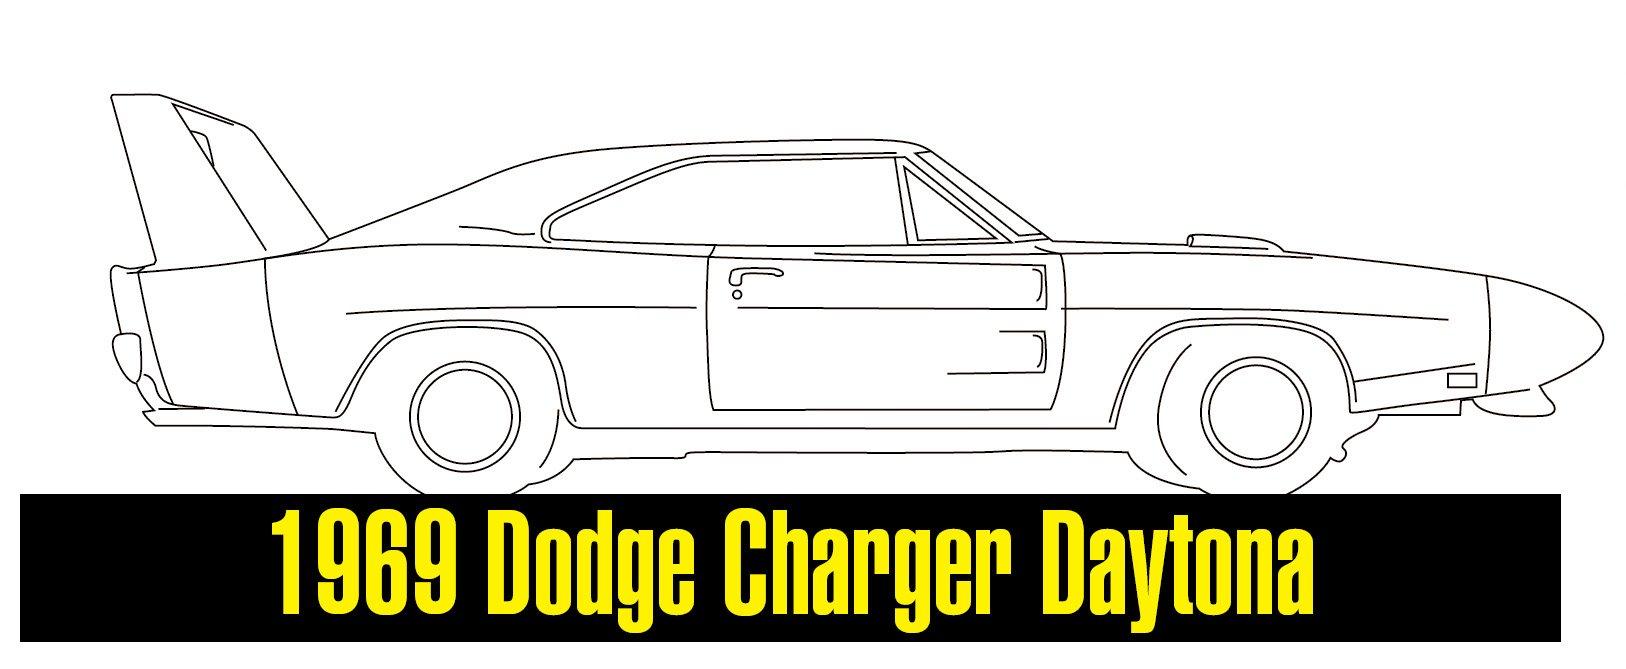 Classic_Dodge_69_Charger_Daytona